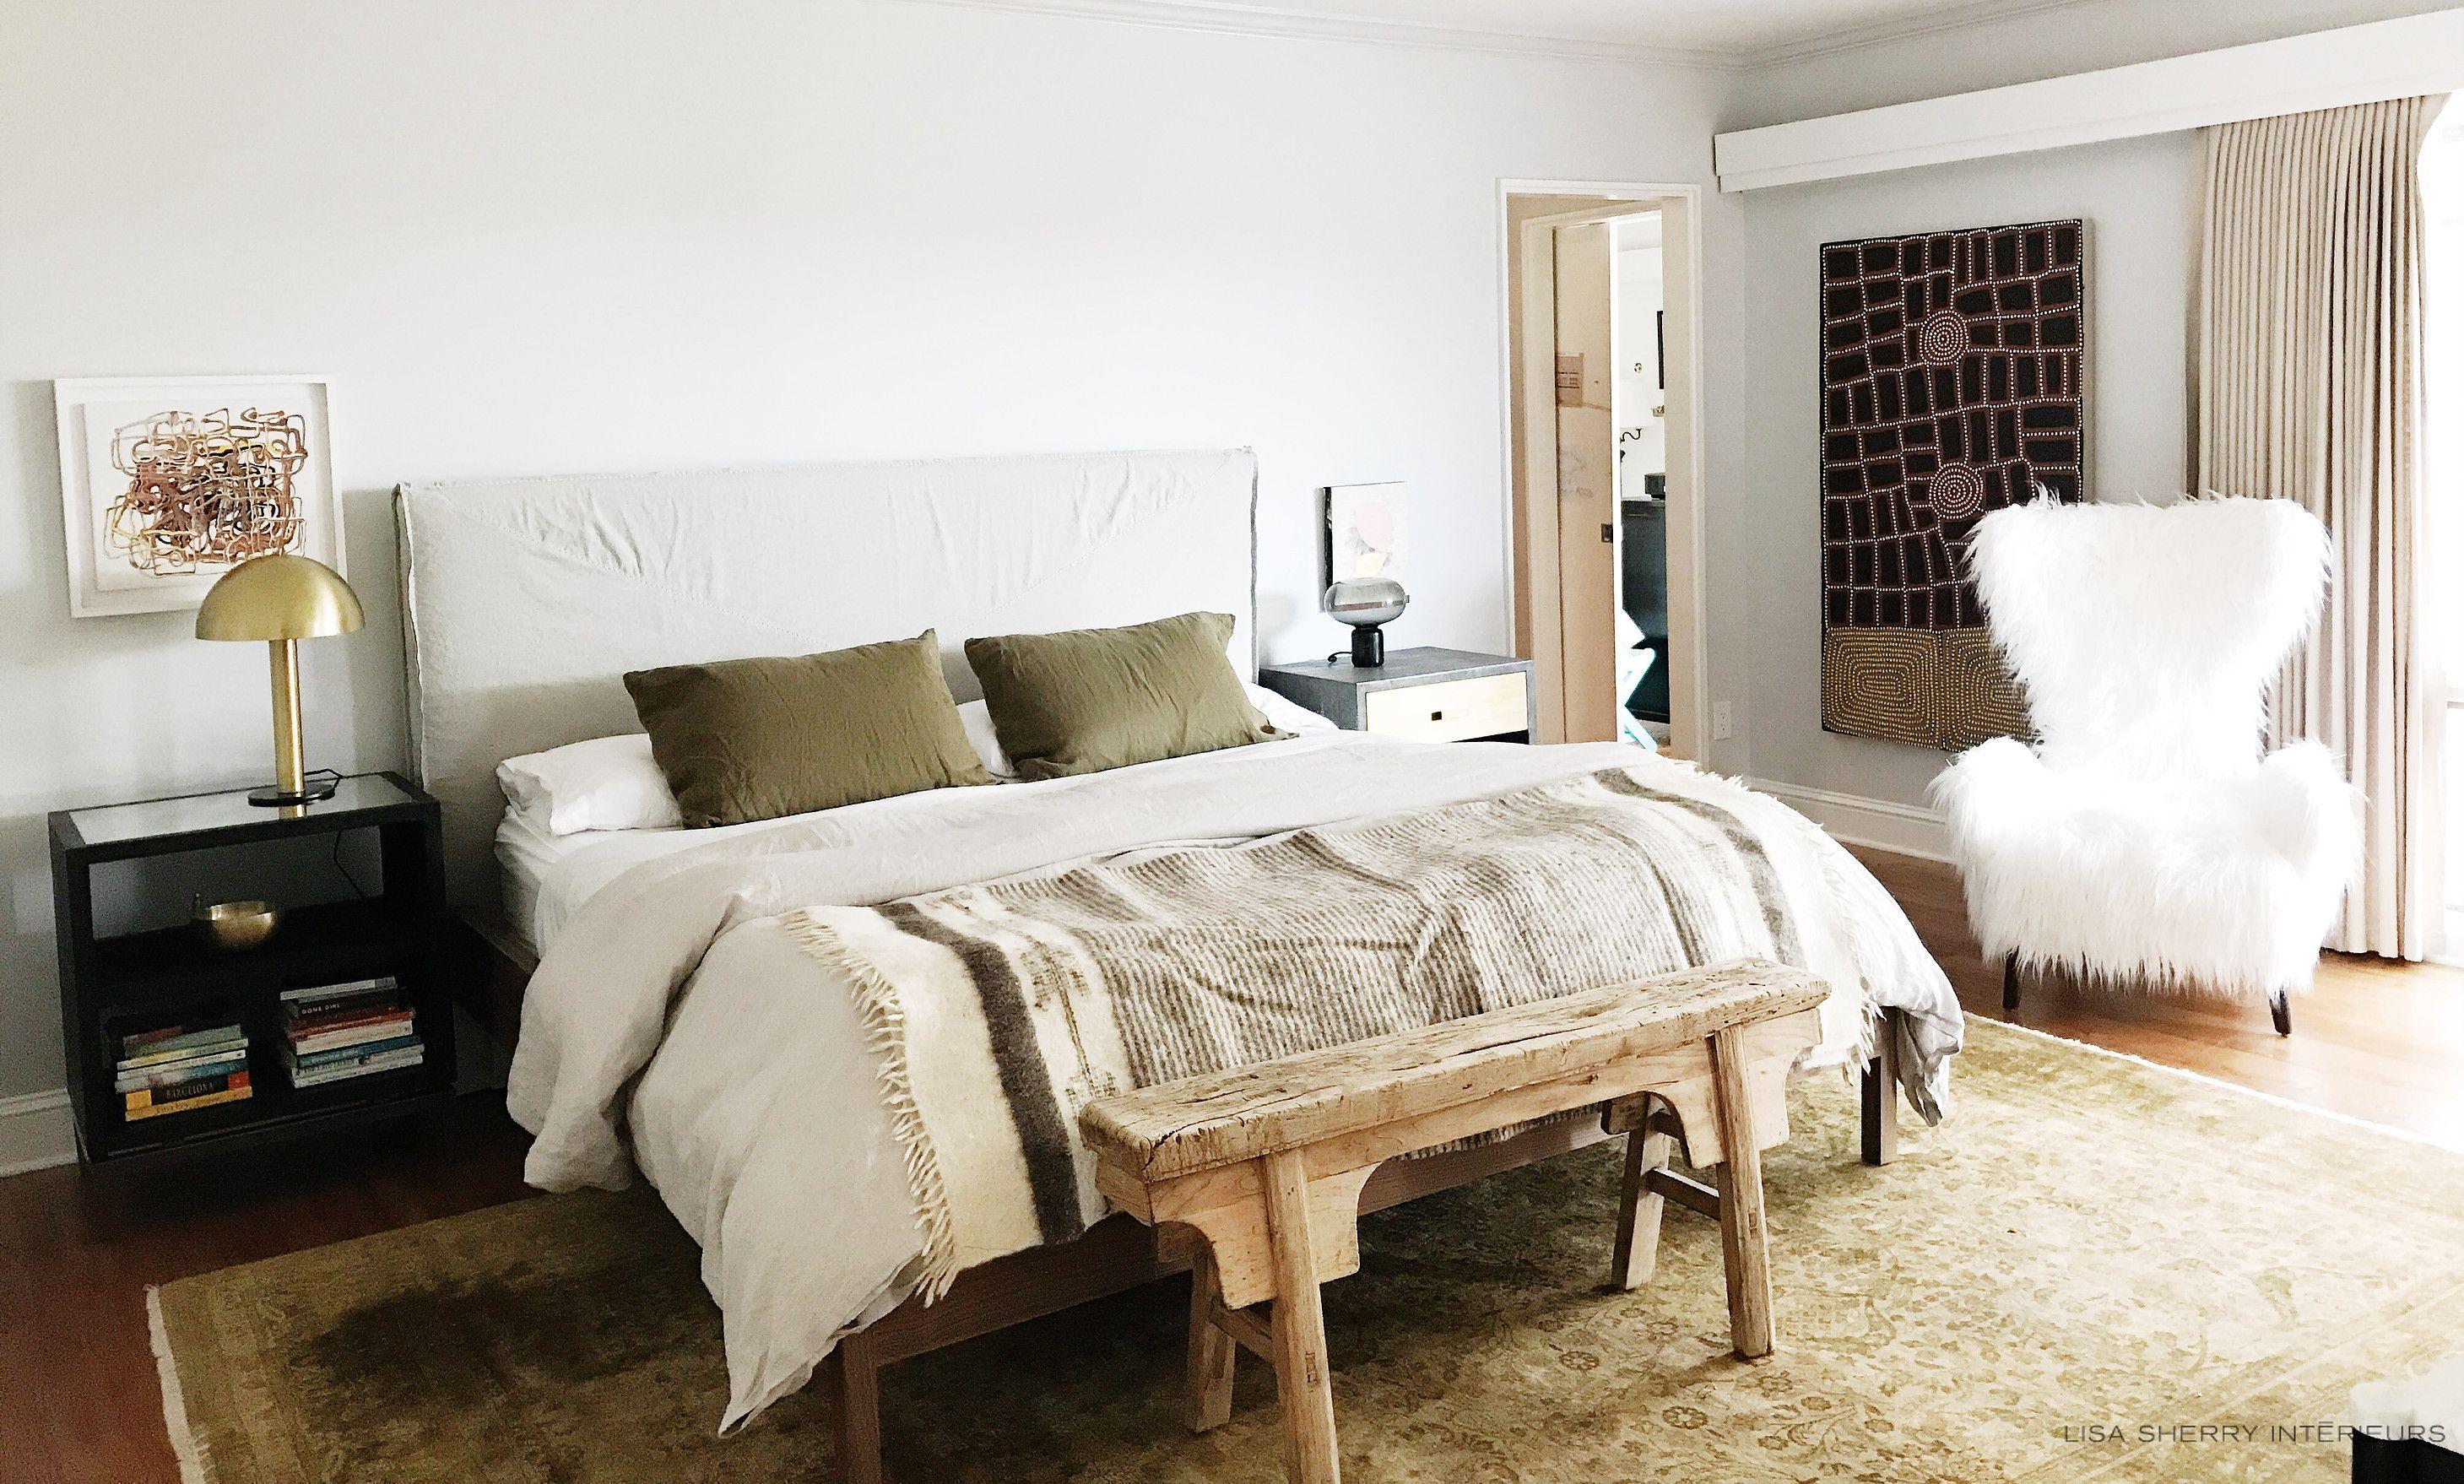 lisasherry   RALEIGH   NC JL   Home decor, Furniture, Room